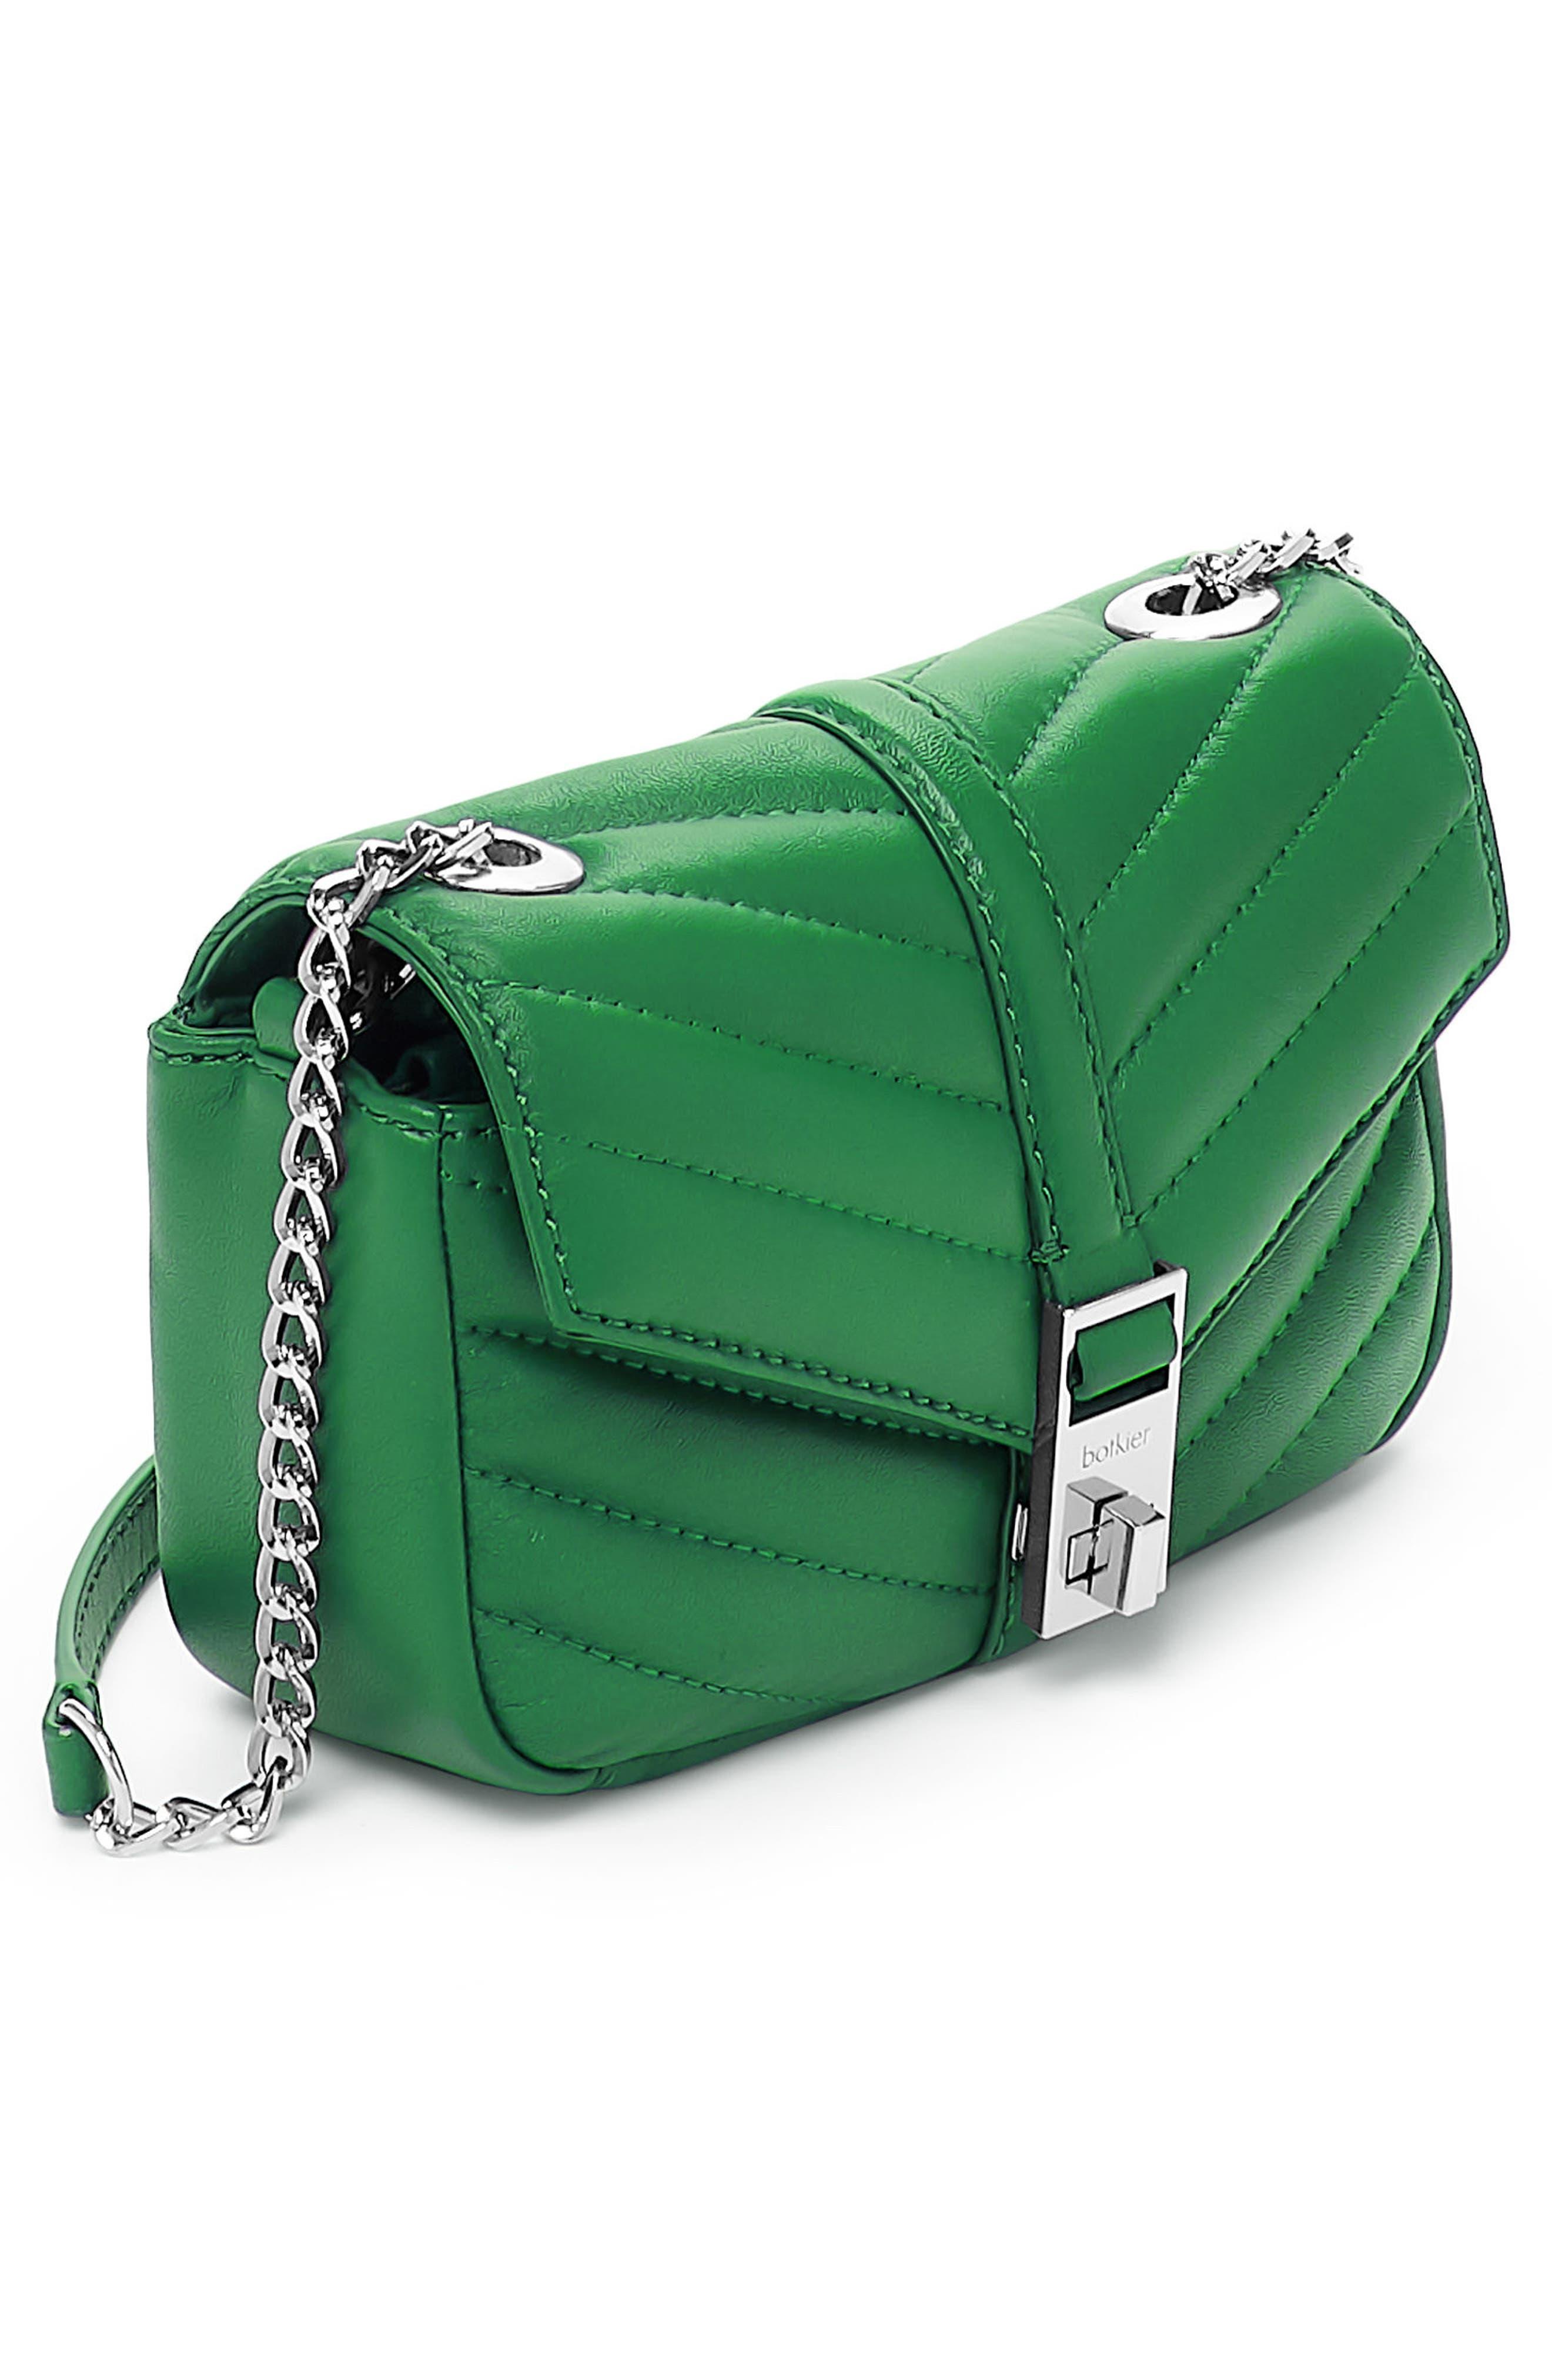 Dakota Quilted Leather Crossbody Bag,                             Alternate thumbnail 3, color,                             GREEN